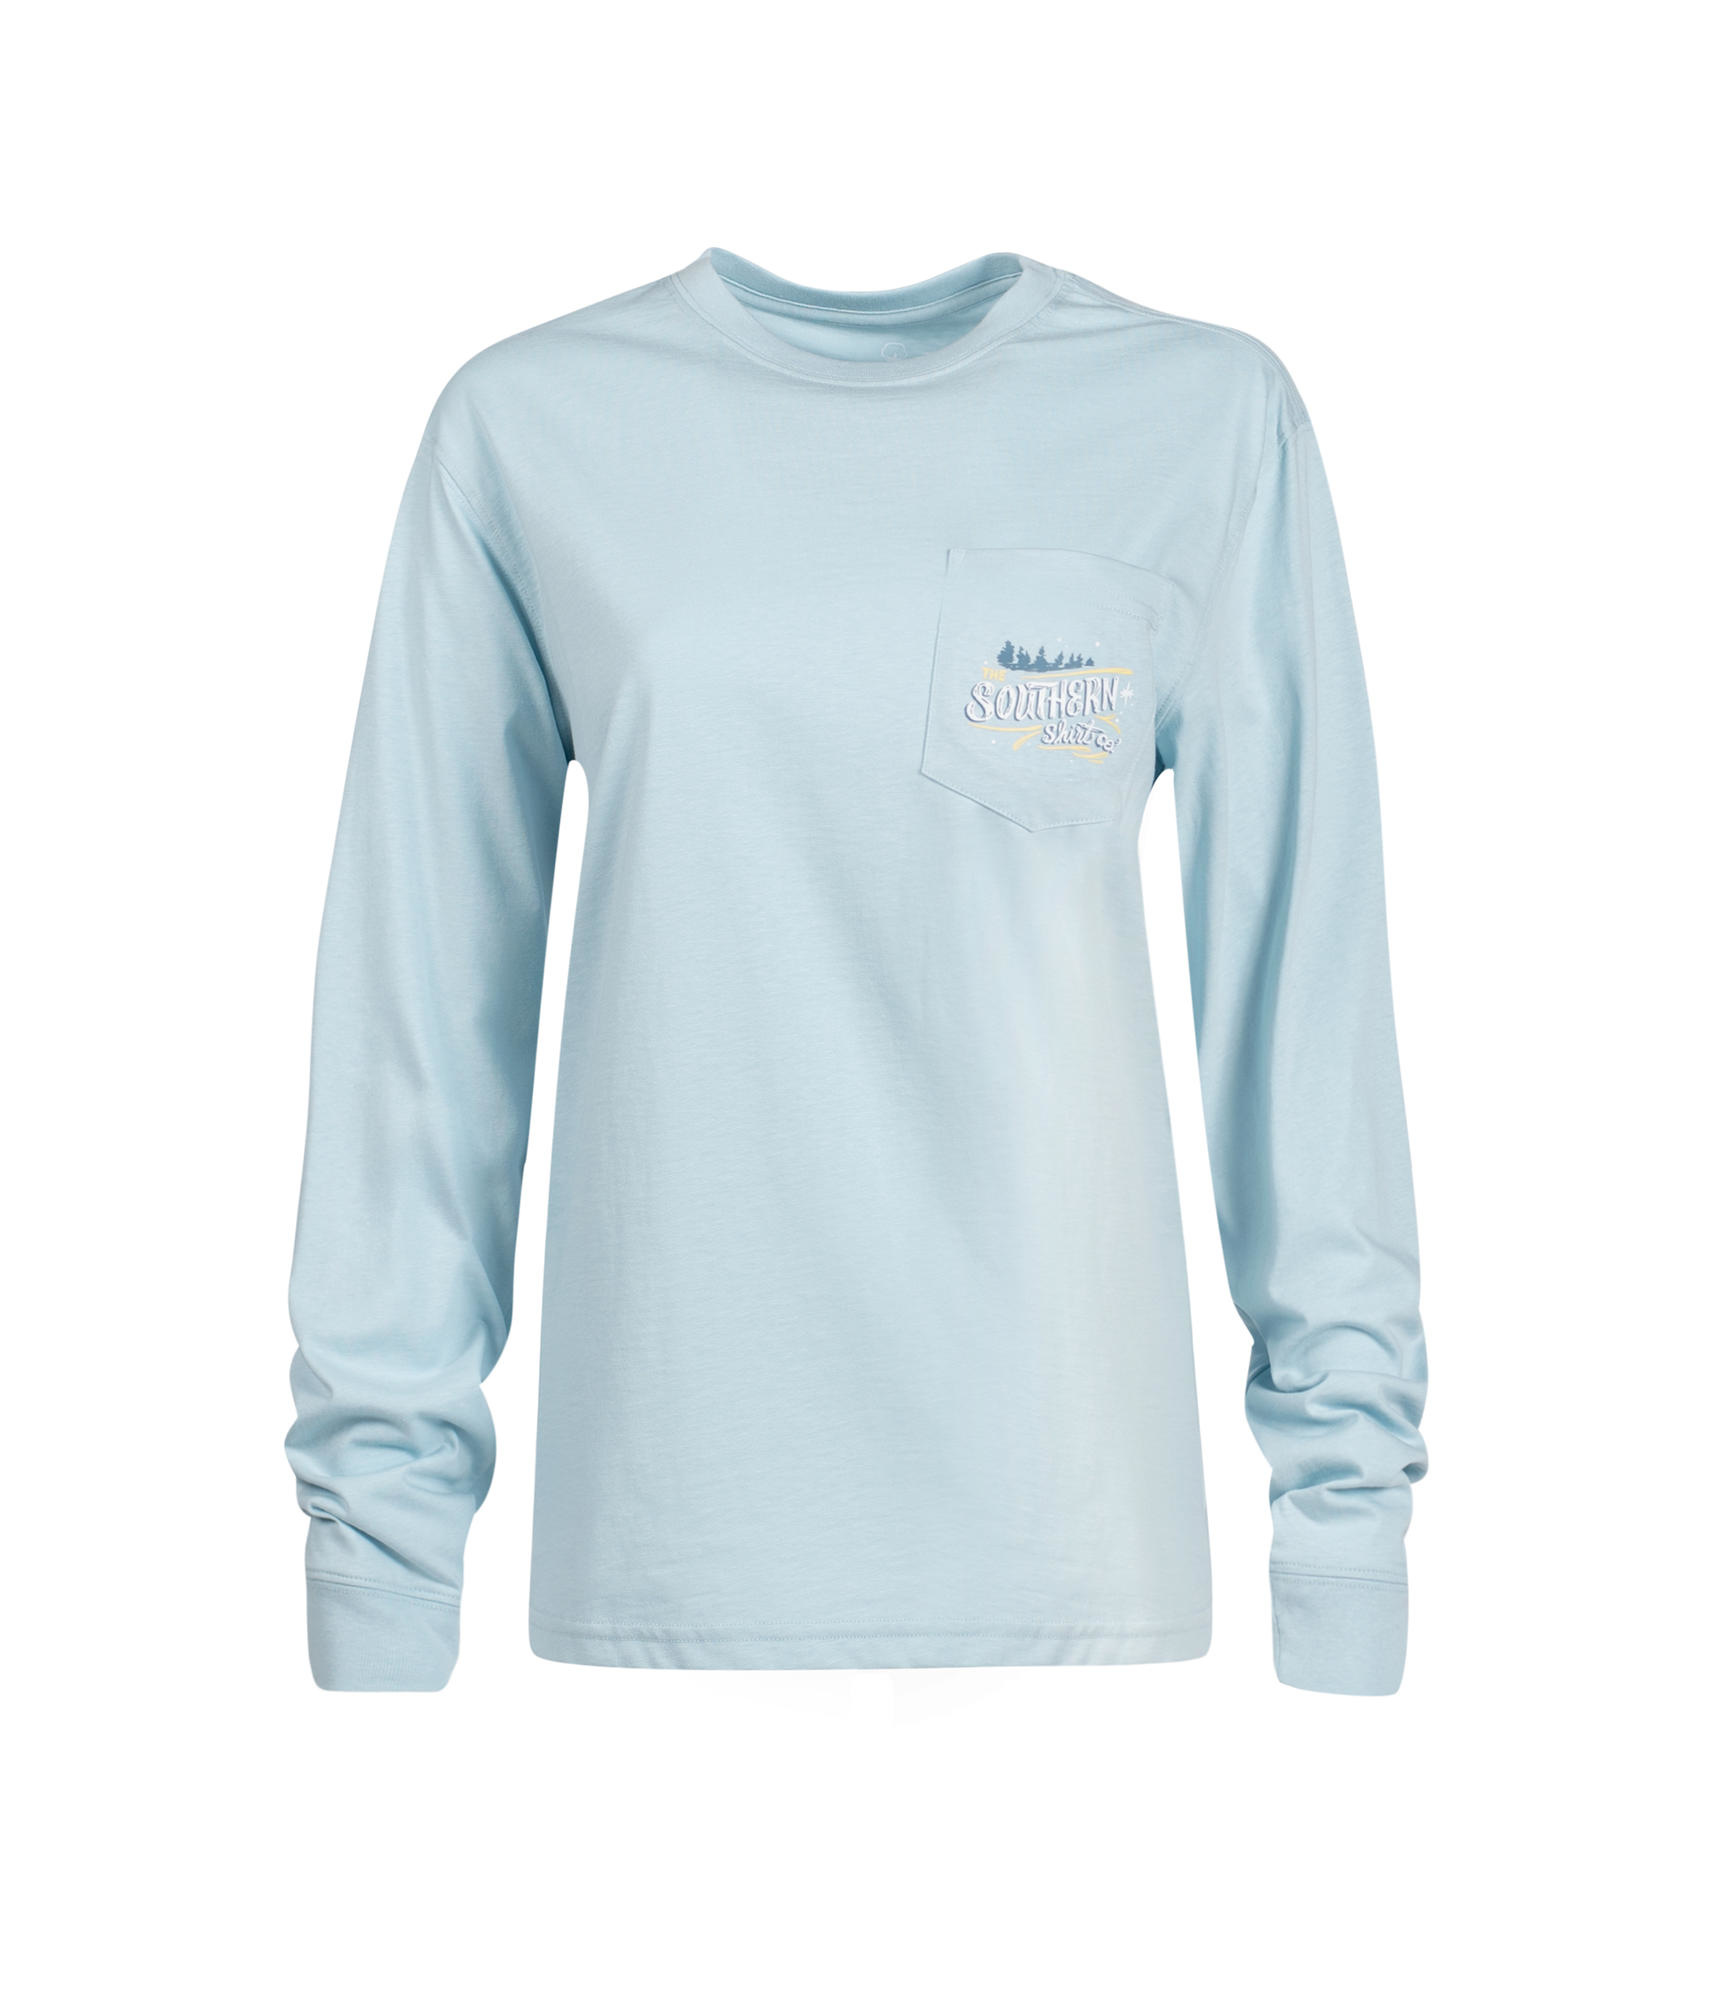 Southern Shirt Fall Retreat LS